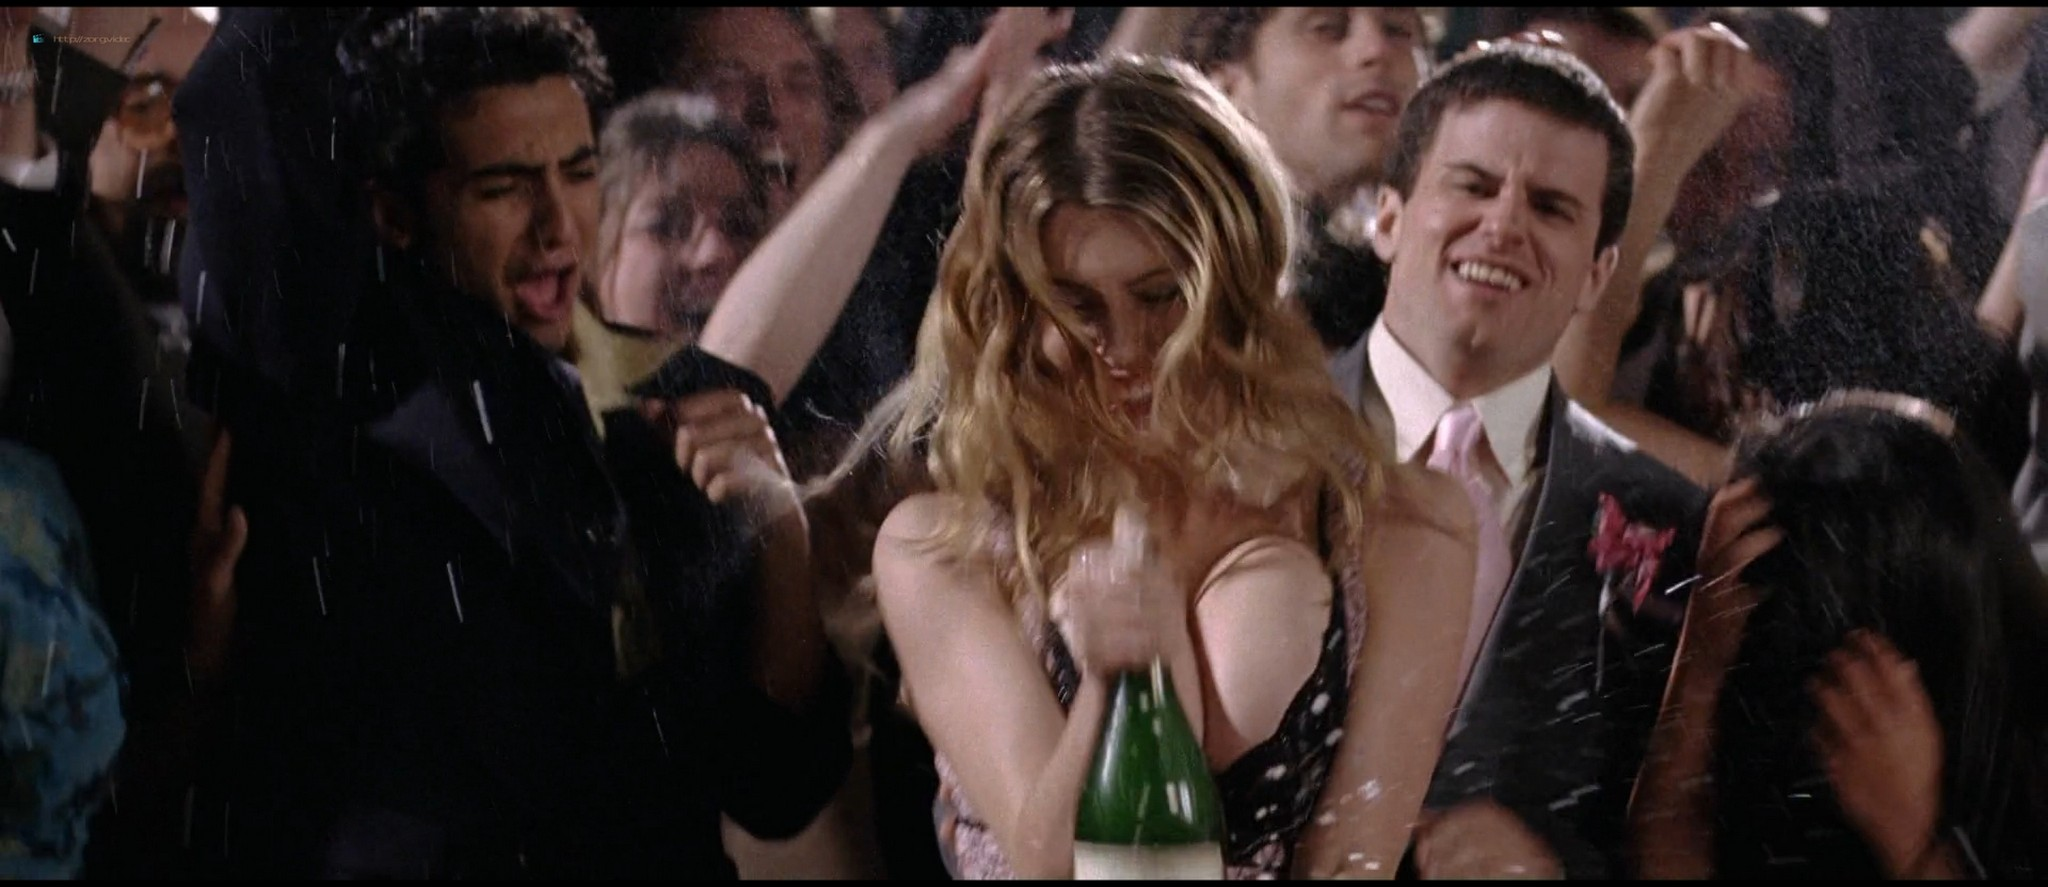 Diora Baird nude topless huge boobs others nude too - Wedding Crashers (2005) HD 1080p BluRay (4)